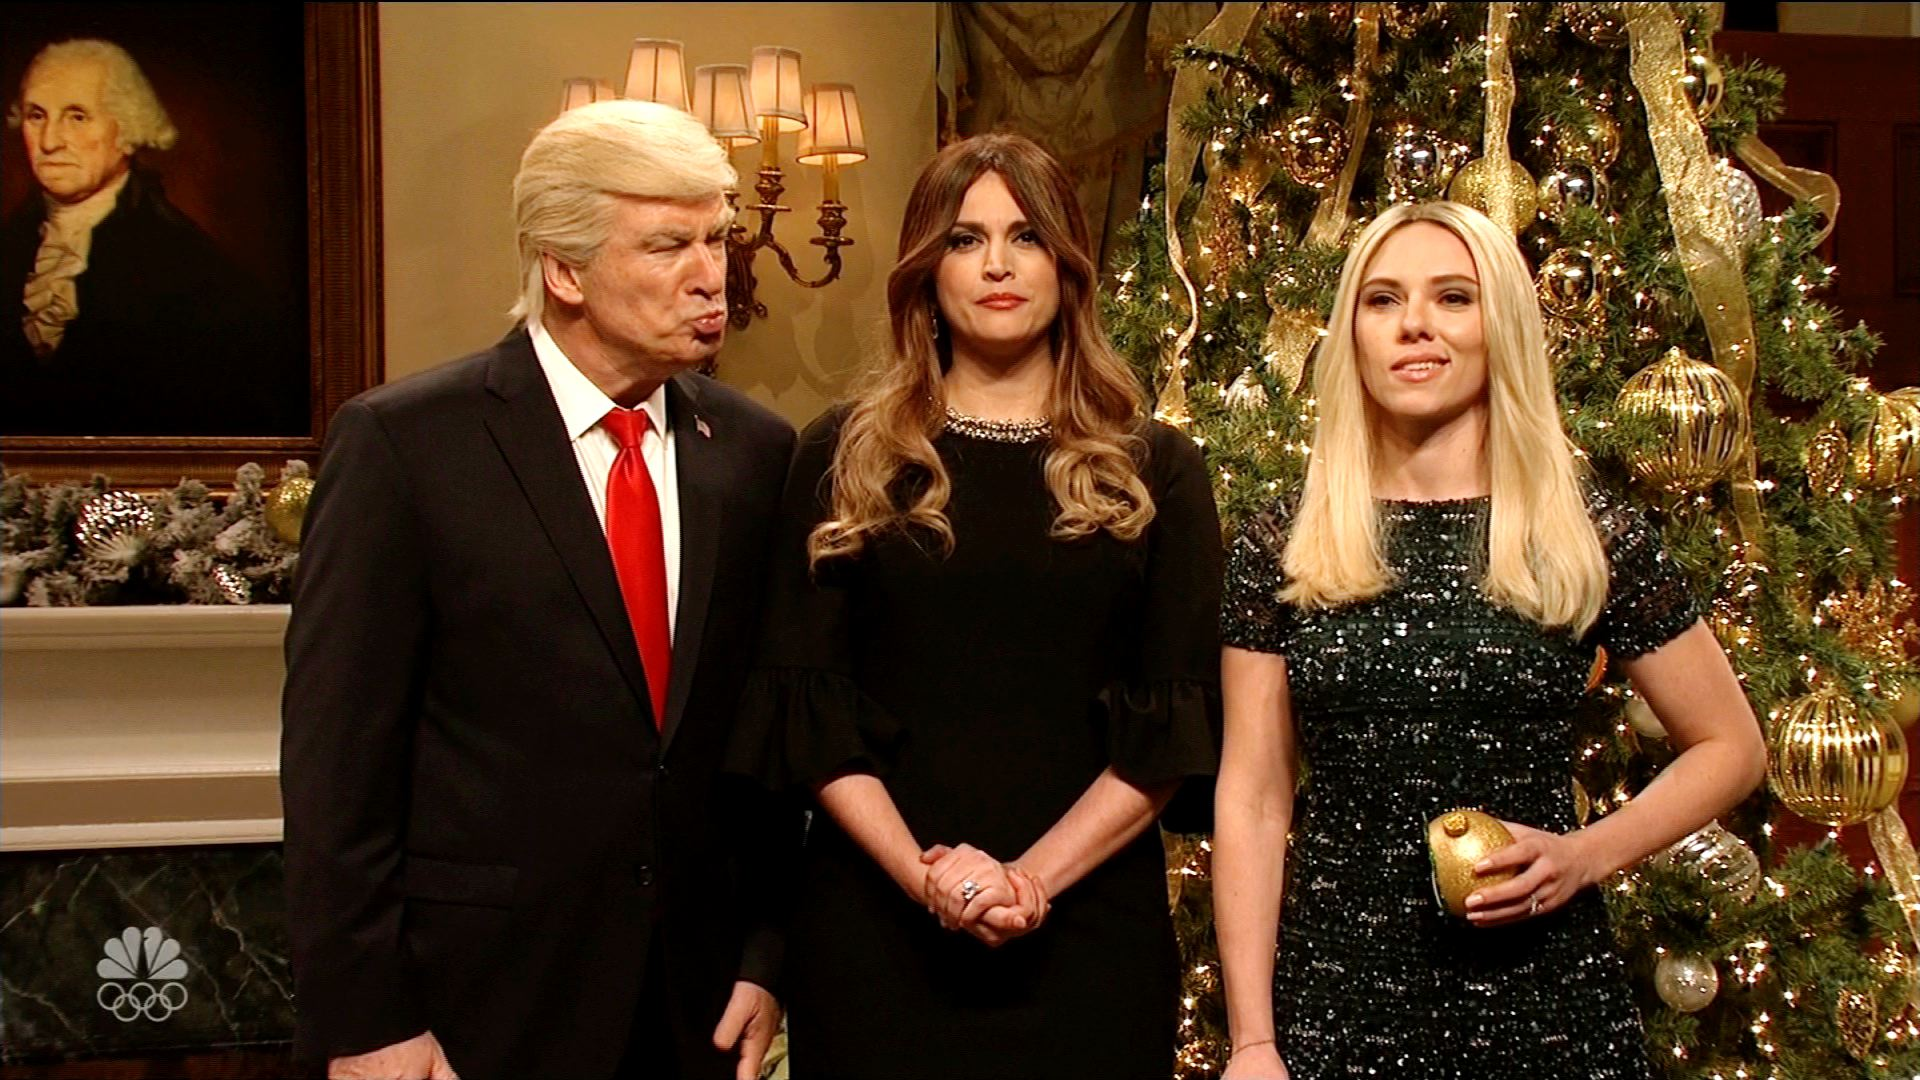 Snl Christmas Trump Skit 2020 SNL': Trump trims Christmas tree with 'losers'   CNN Video